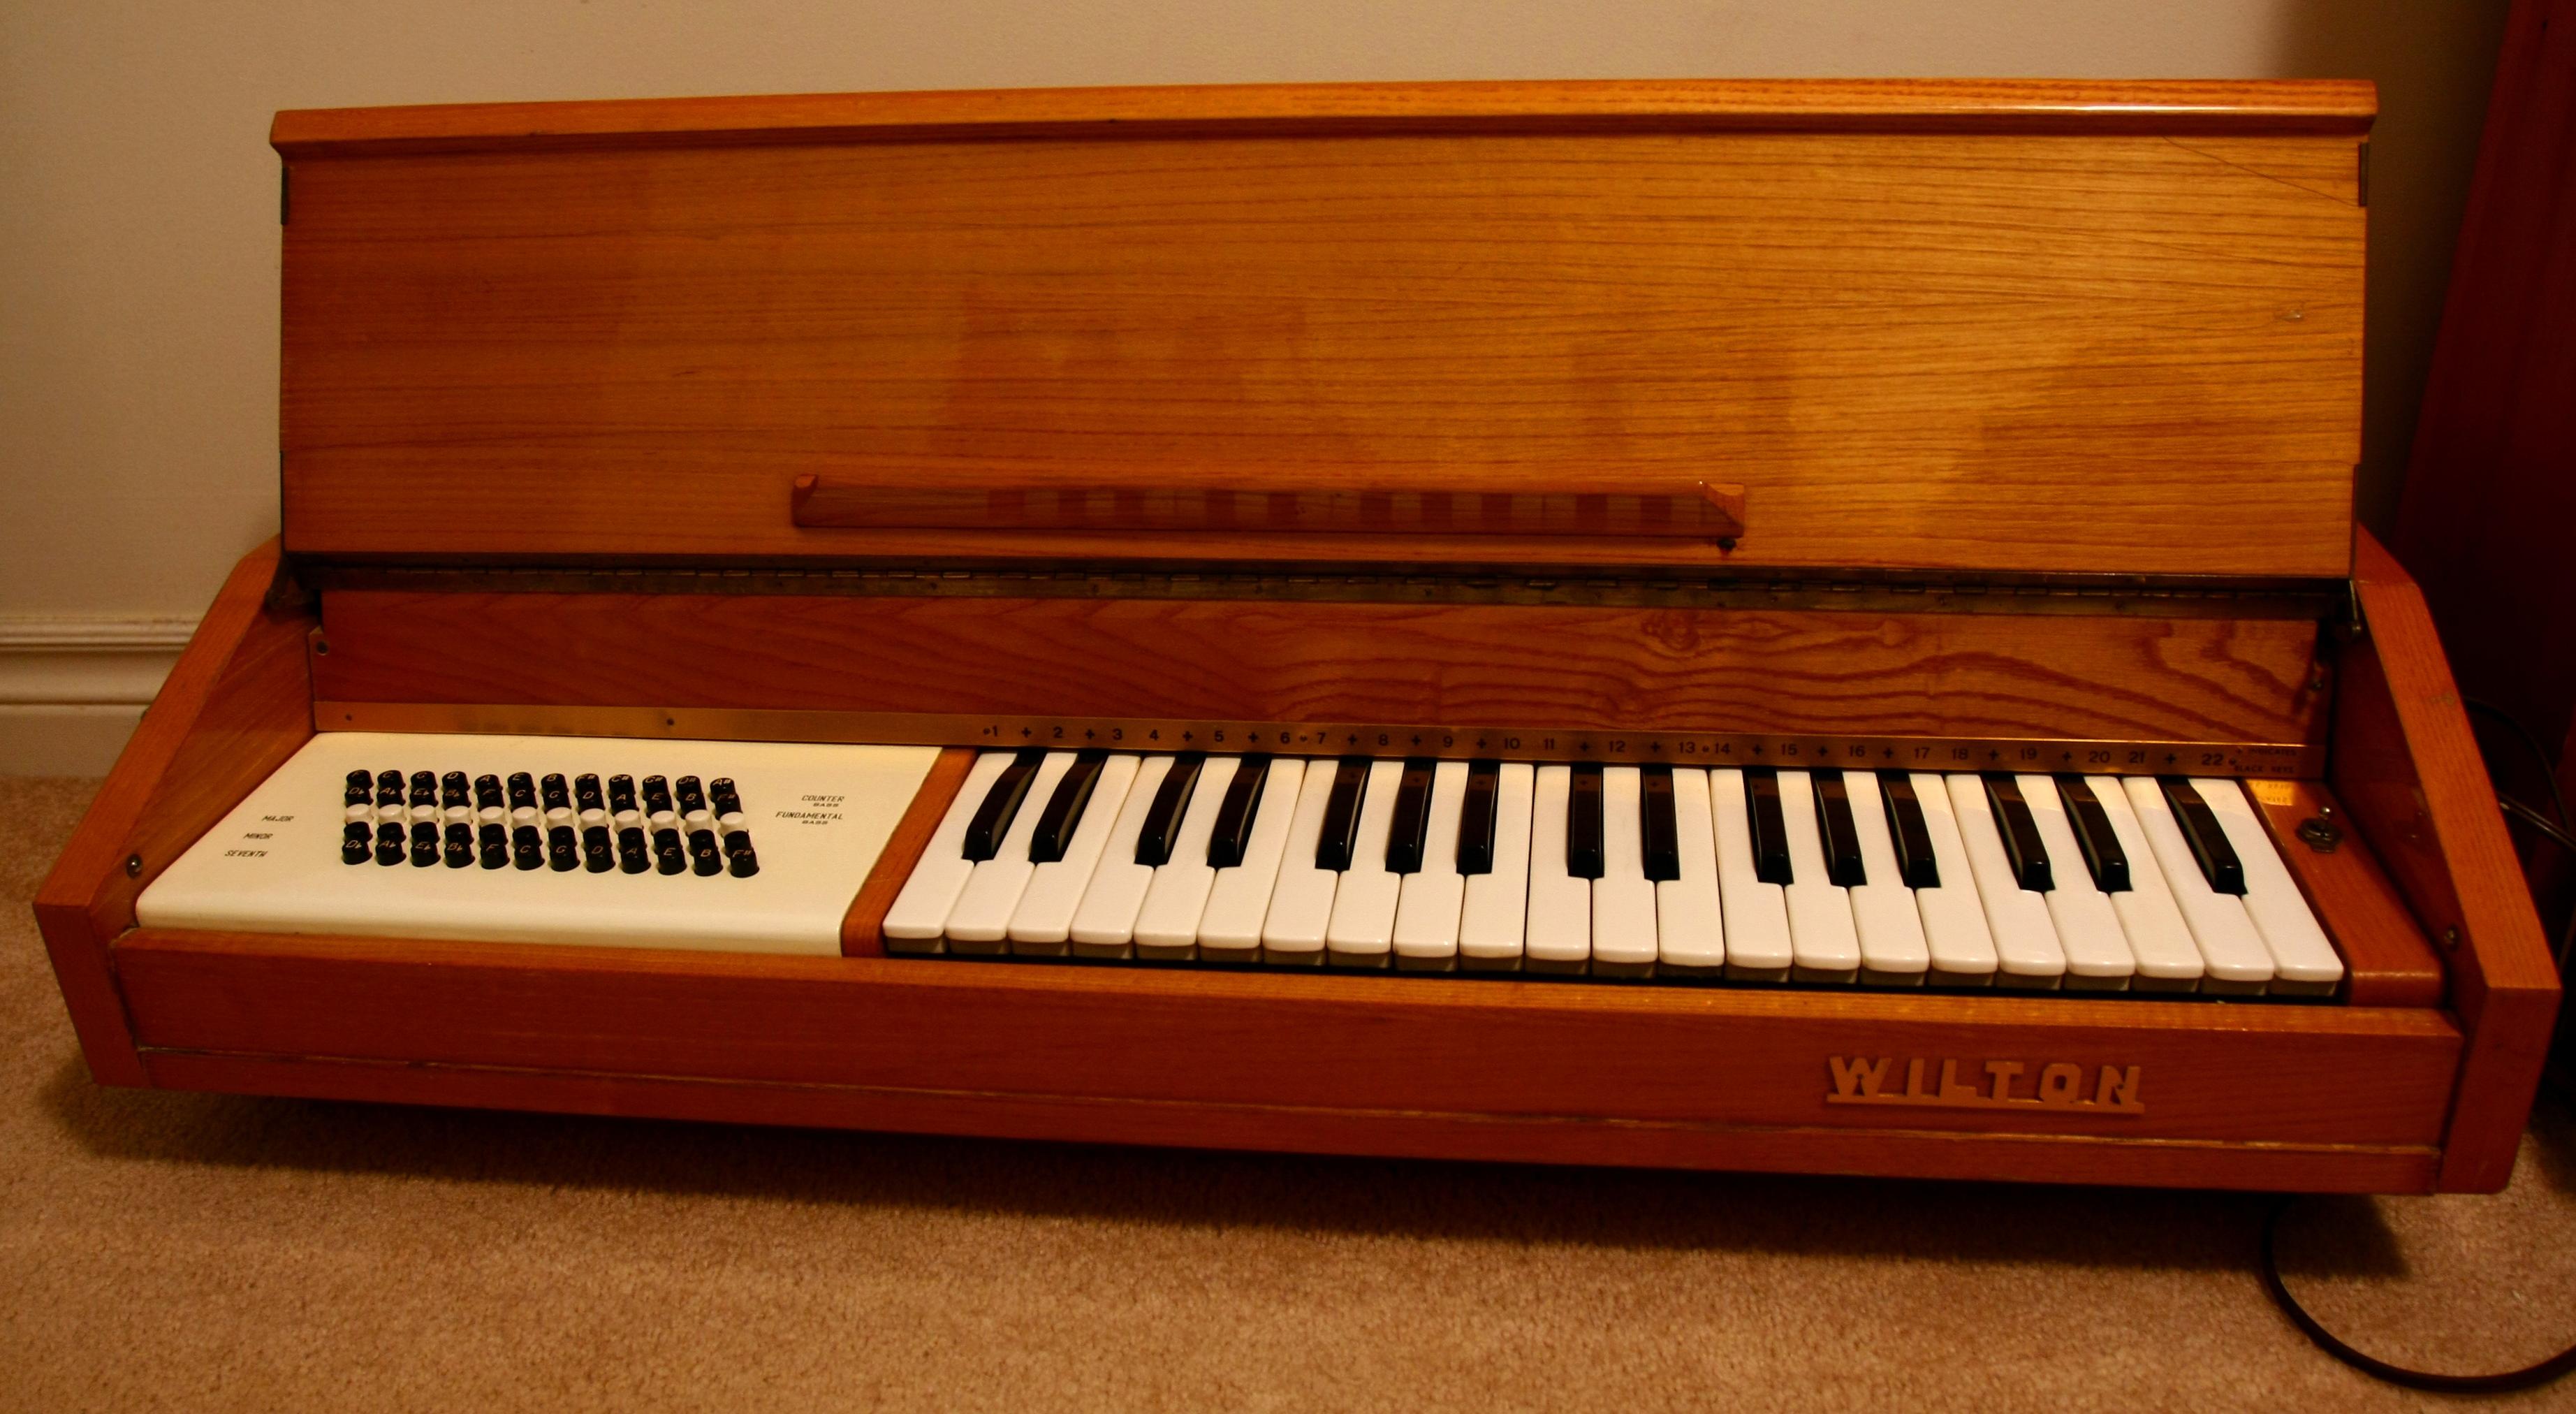 Keyboard Chords Chart: Wilton chord organ.jpg - Wikimedia Commons,Chart